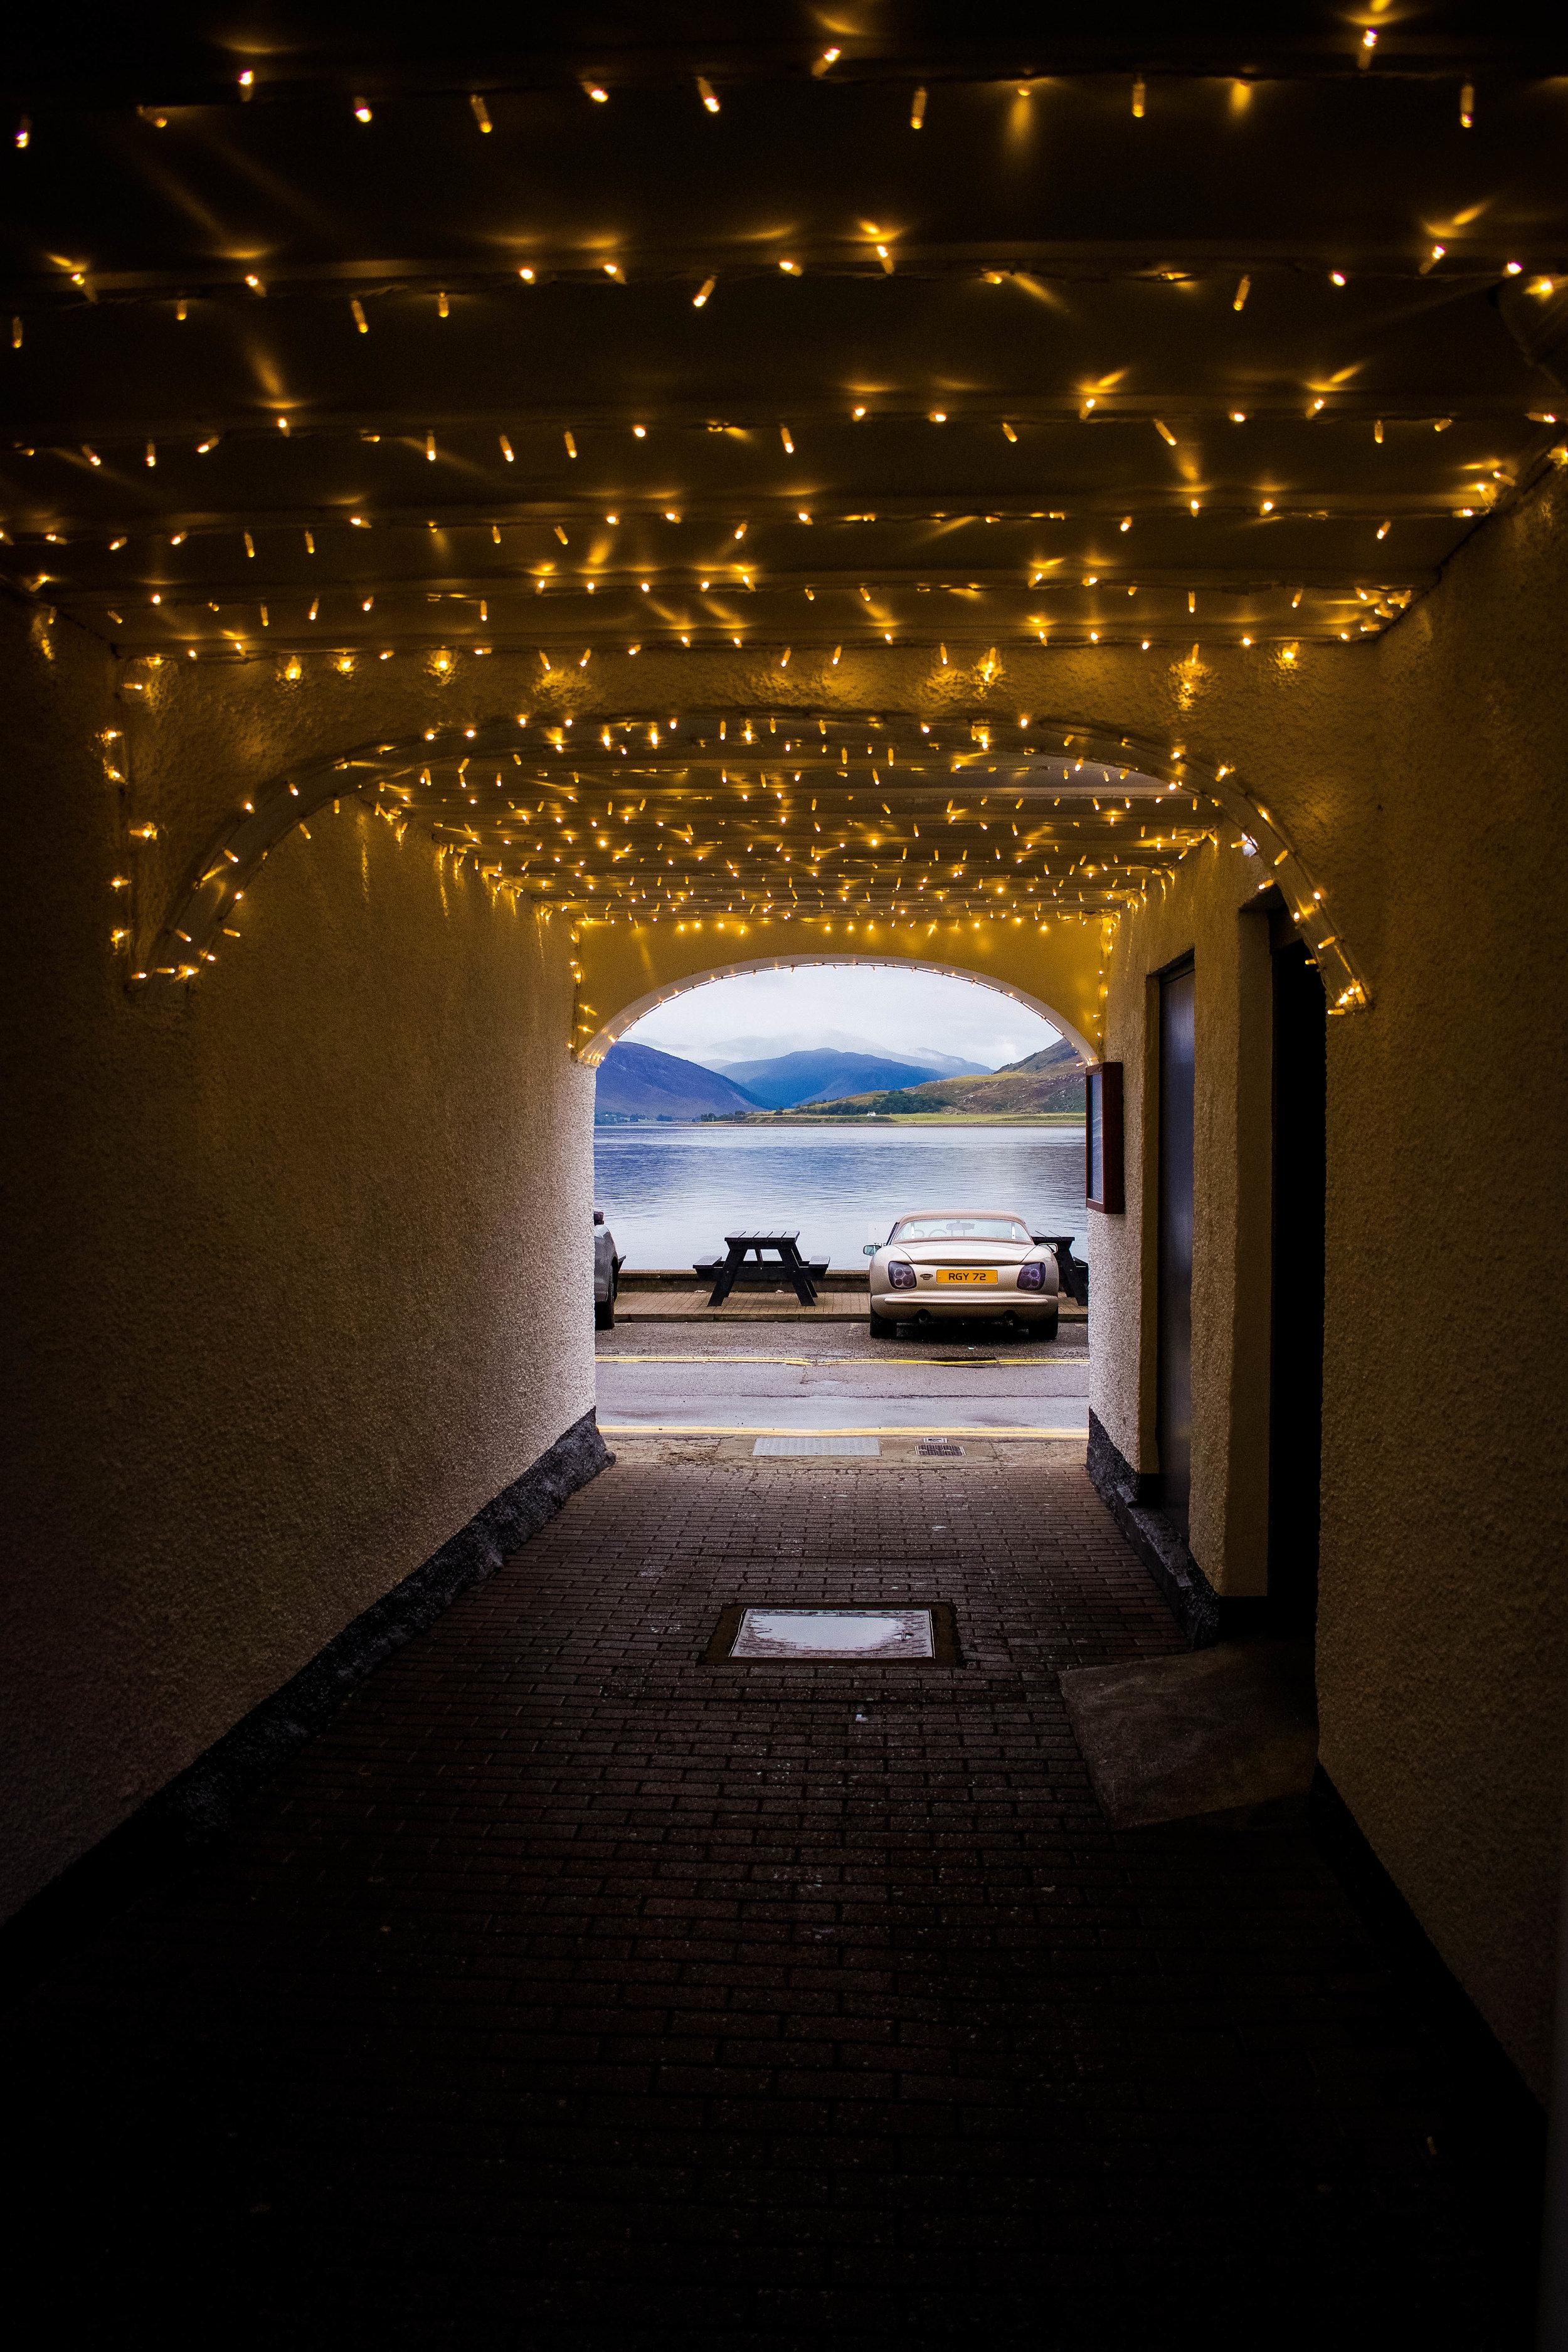 The Arch Inn, Ullapool, Scotland